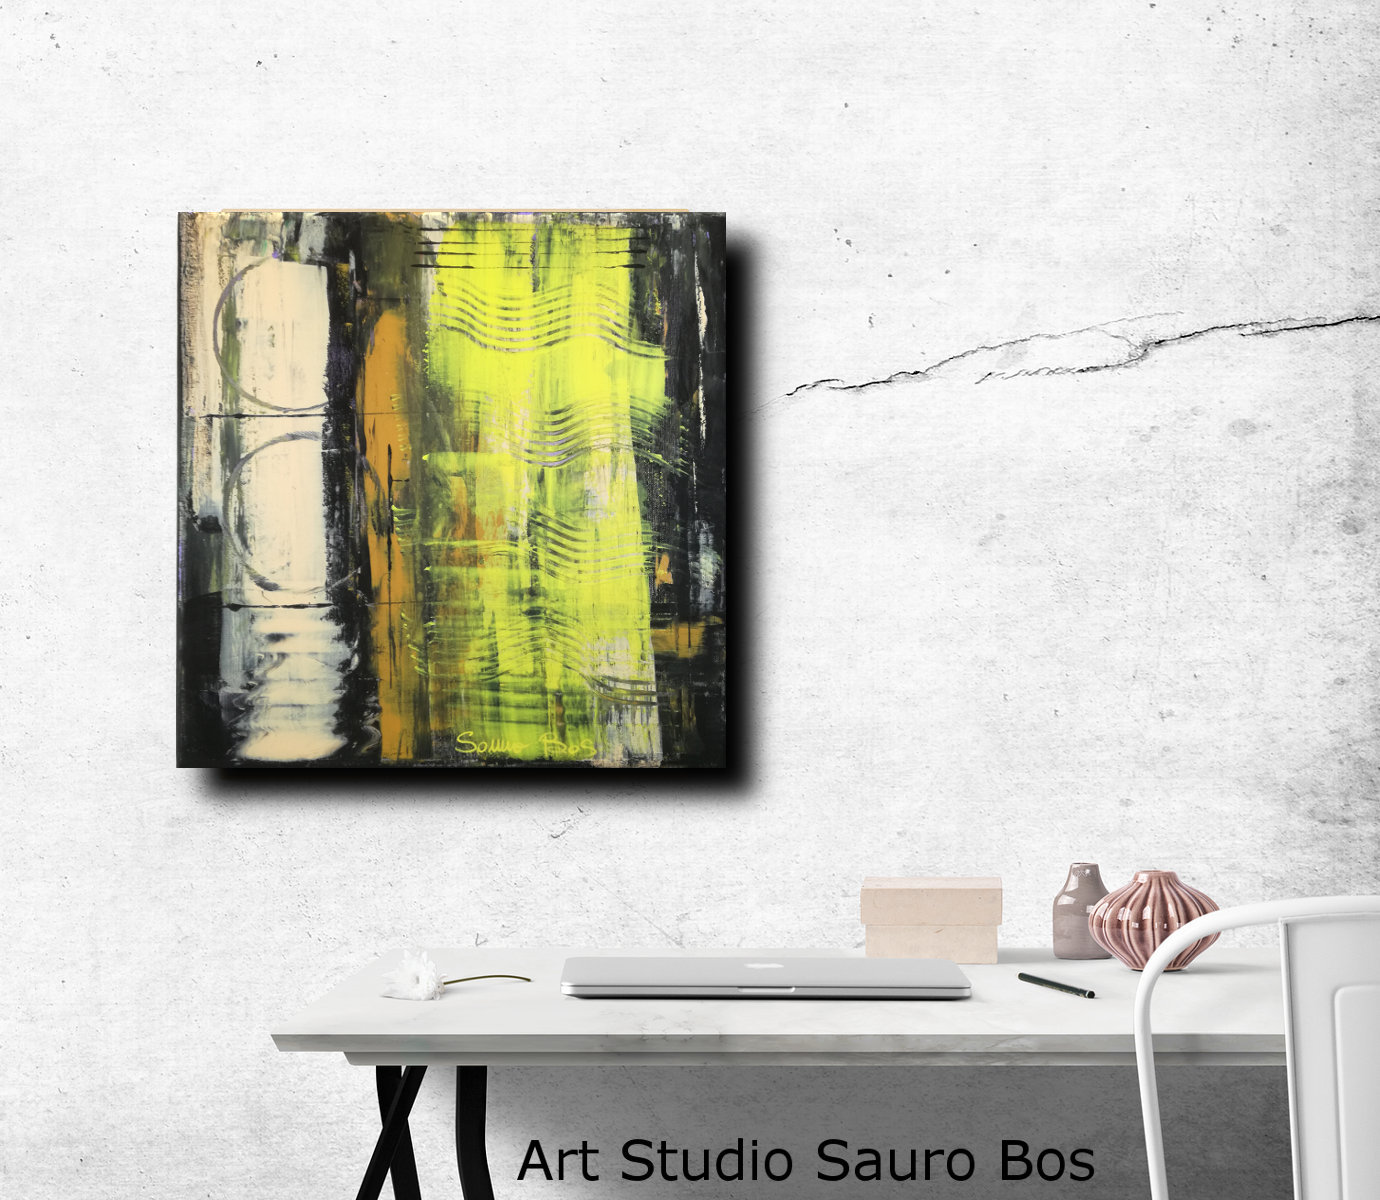 moderni astratti dipinti c029 - quadri moderni  fatti a mano 50x50